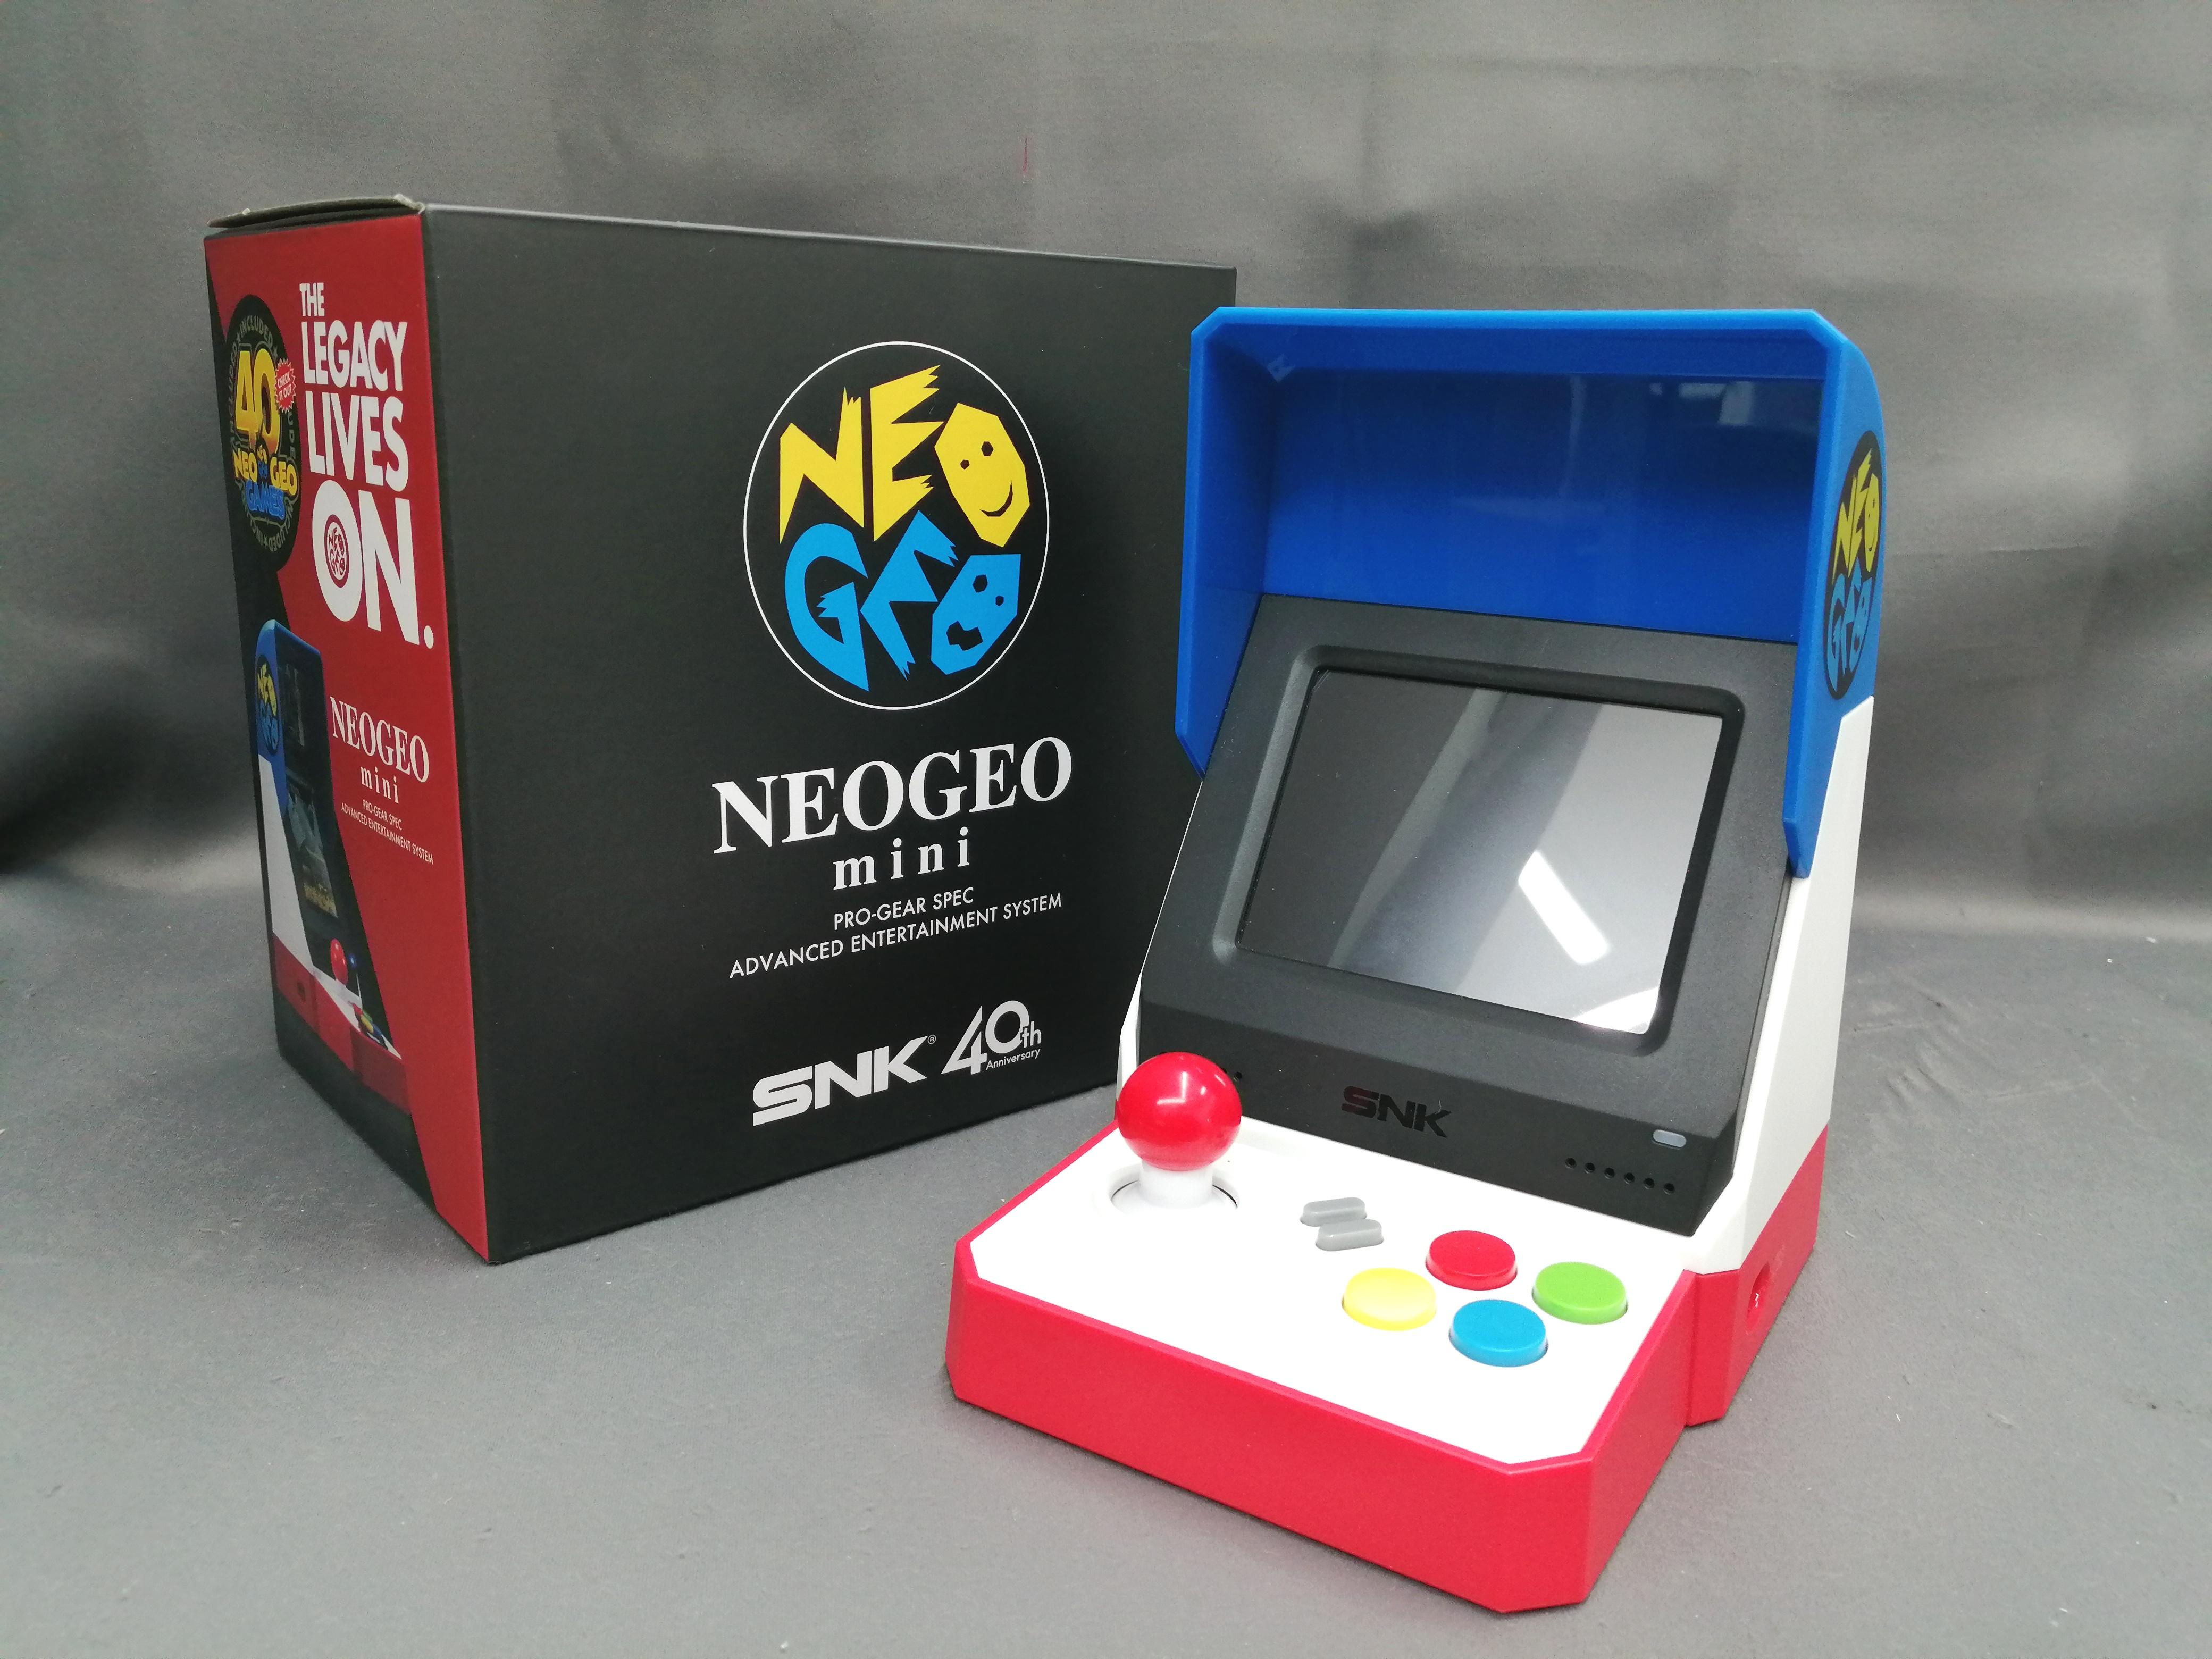 NEOGEO MINI|SNK